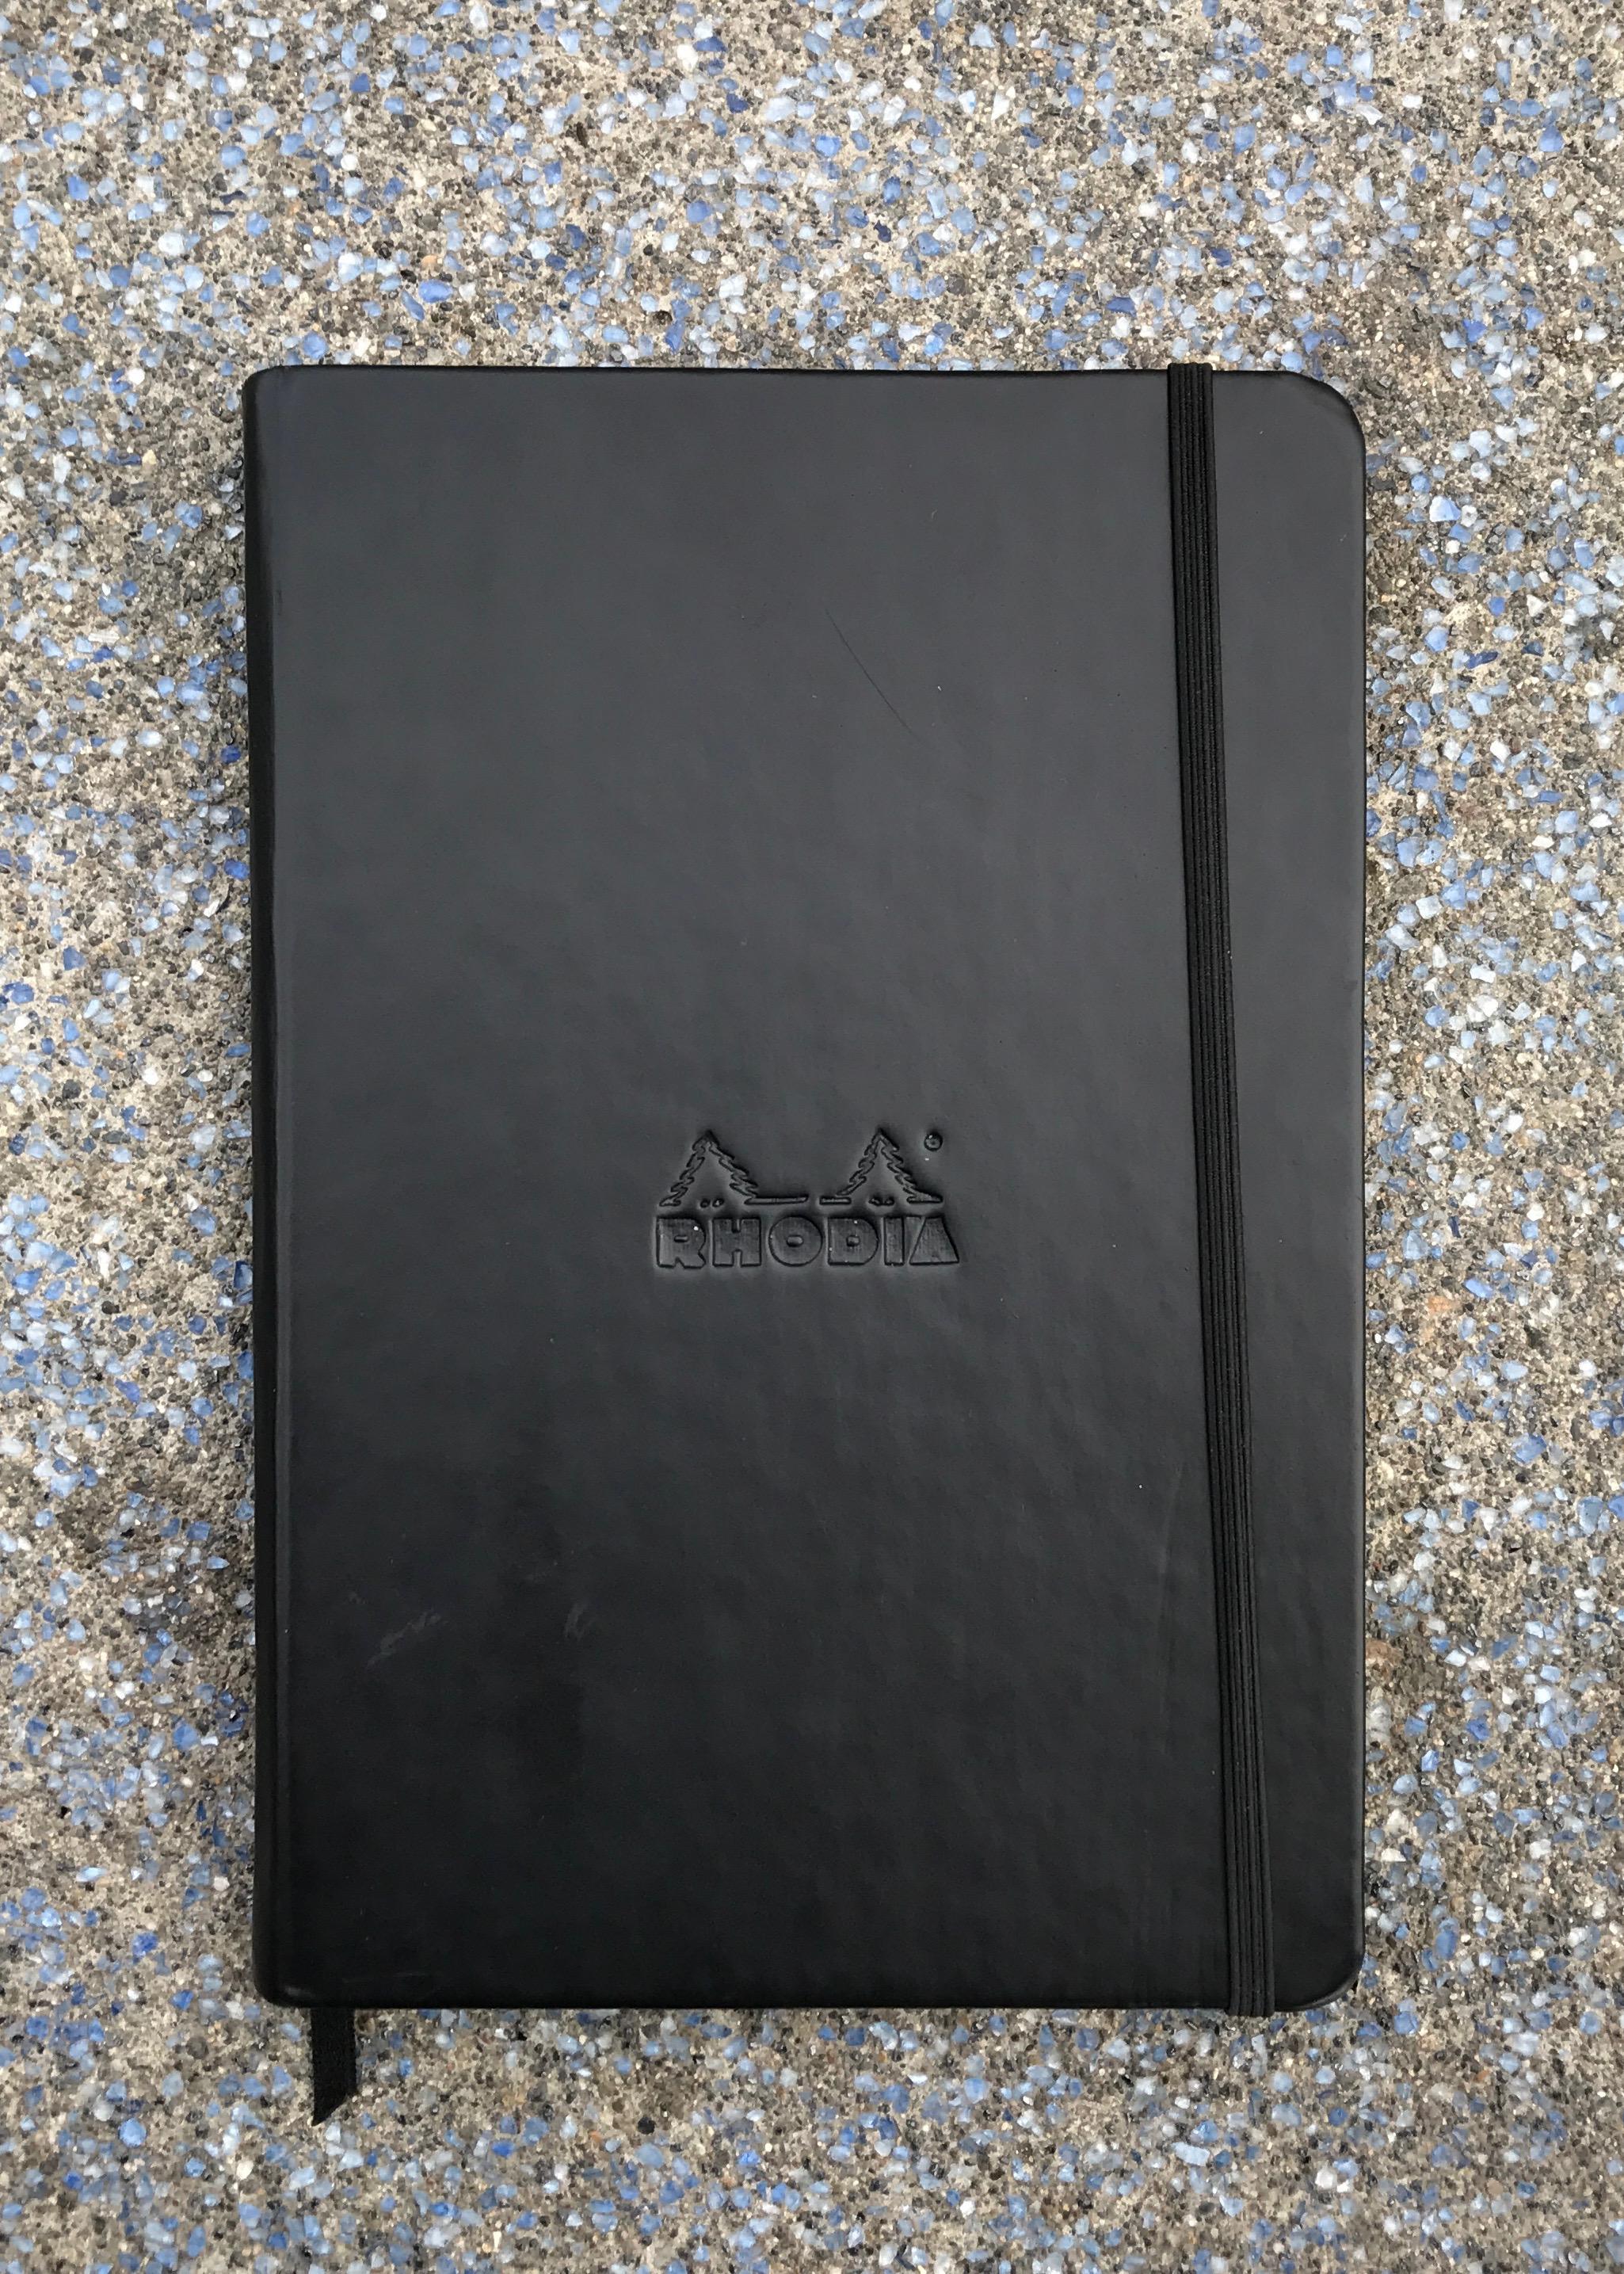 RhodiaWebnotebook - 3.jpg